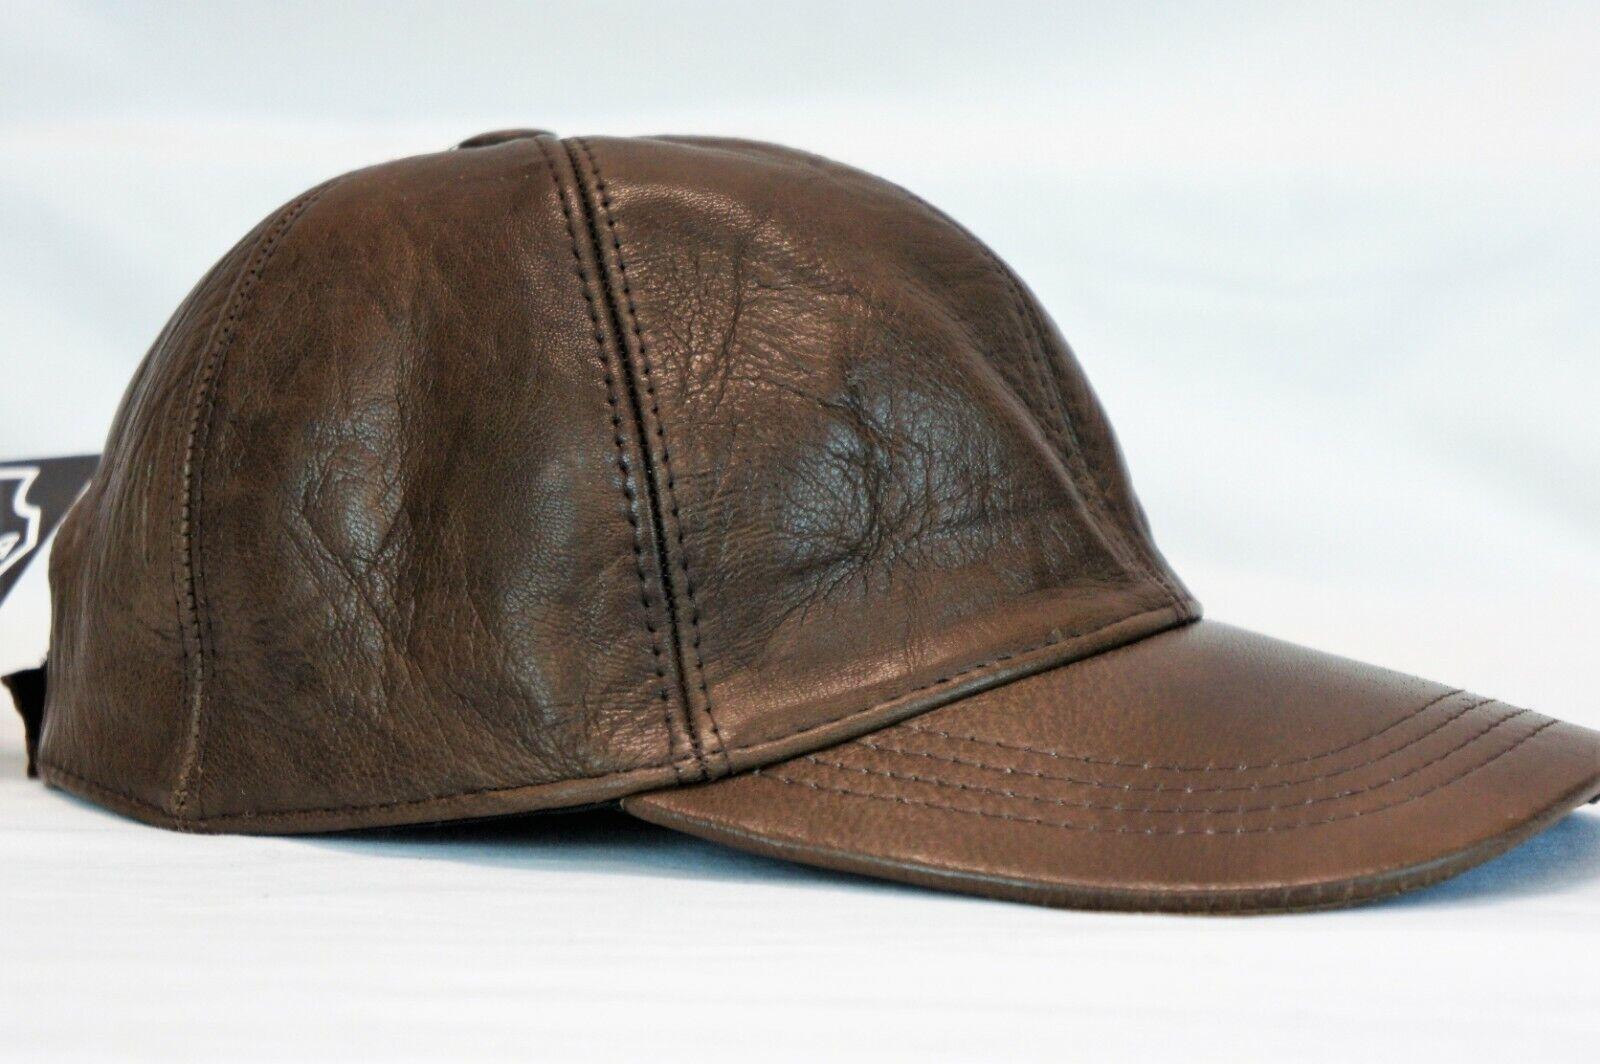 New 100/% Genuine Real Lambskin Leather Baseball Cap Hat Sport Visor 12 COLORS